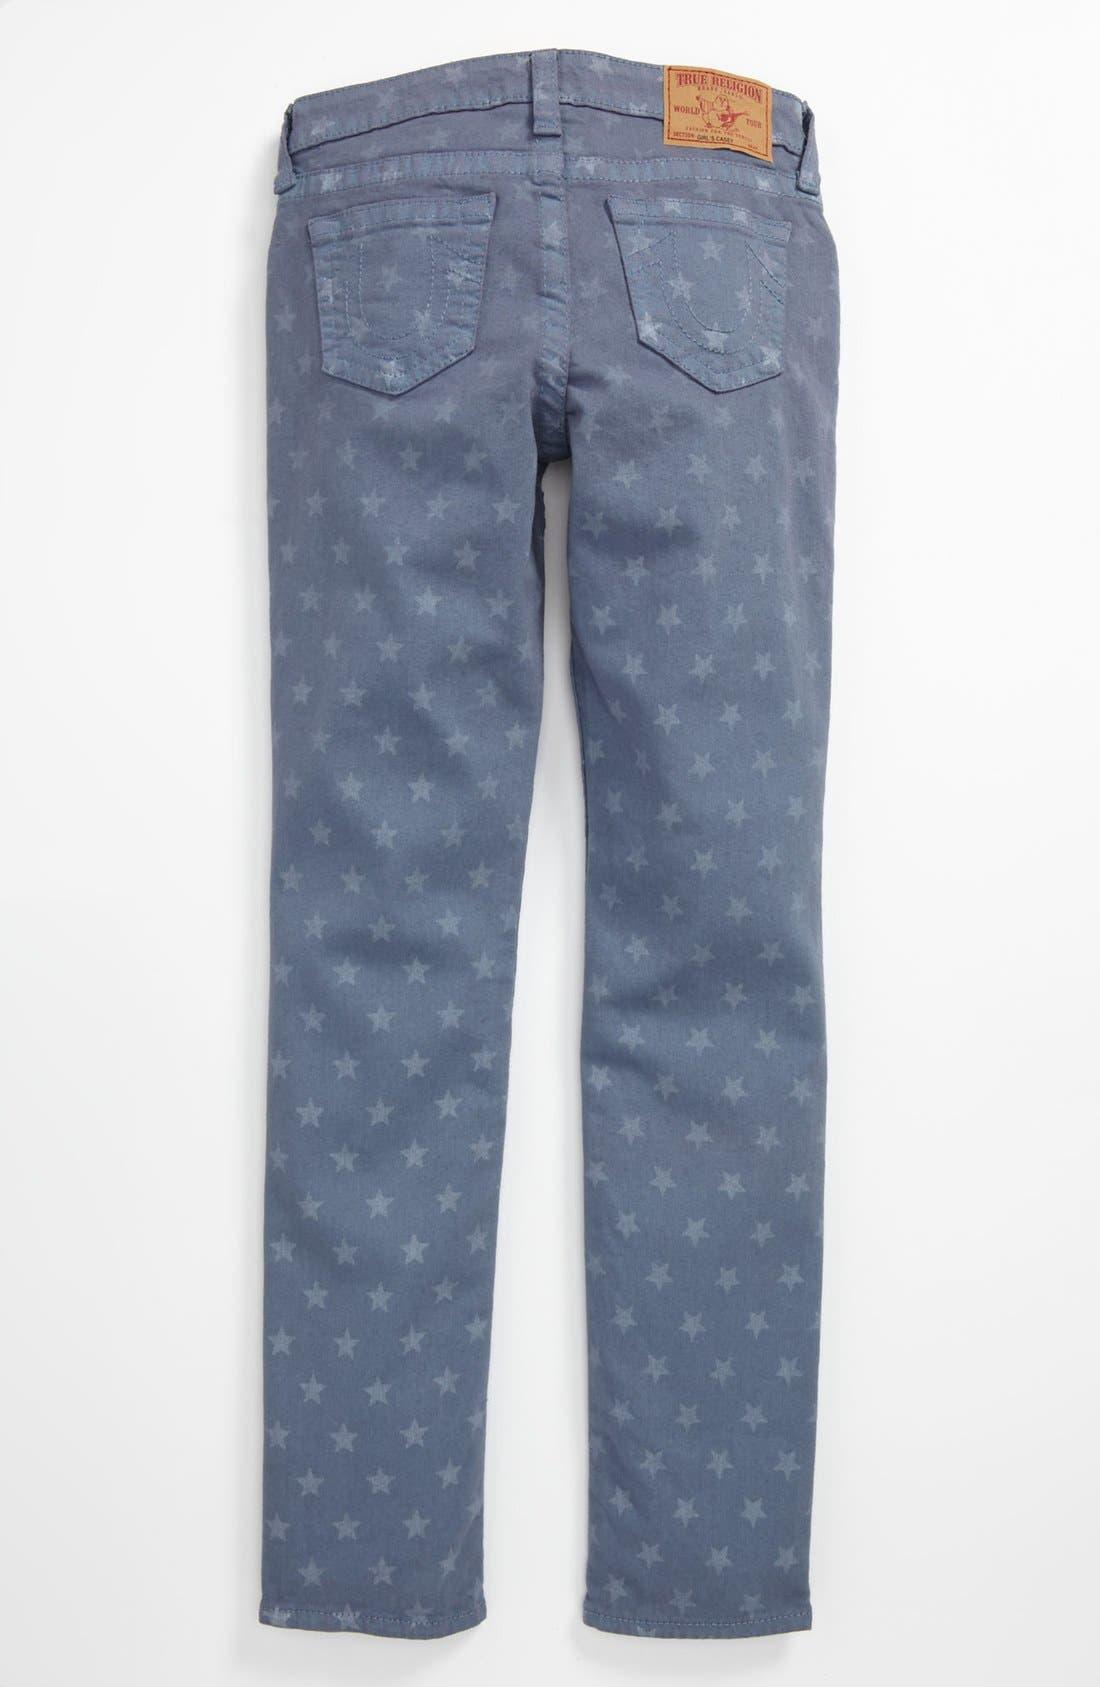 Alternate Image 1 Selected - True Religion Brand Jeans Skinny Leg Jeans (Big Girls)